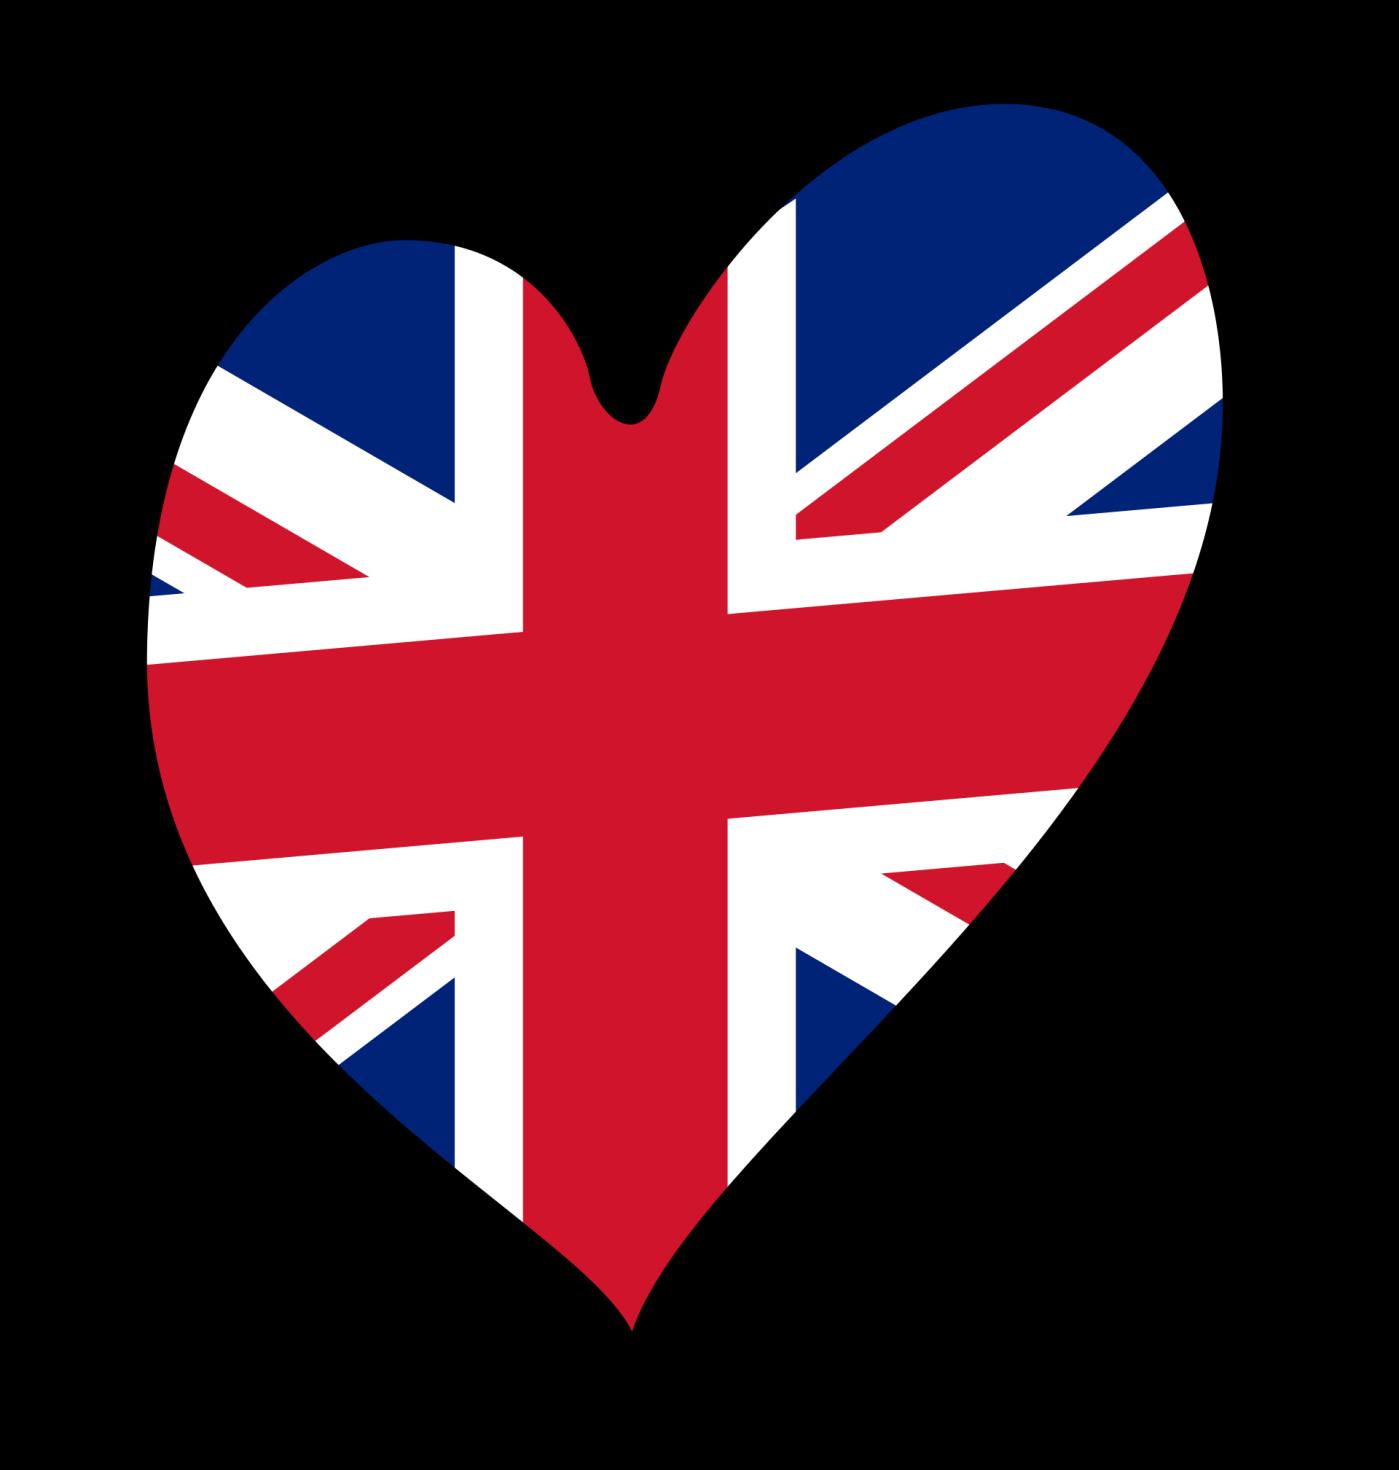 Wikipedia (https://fr.wikipedia.org/wiki/Royaume-Uni_au_Concours_Eurovision_de_la_chanson_2017)